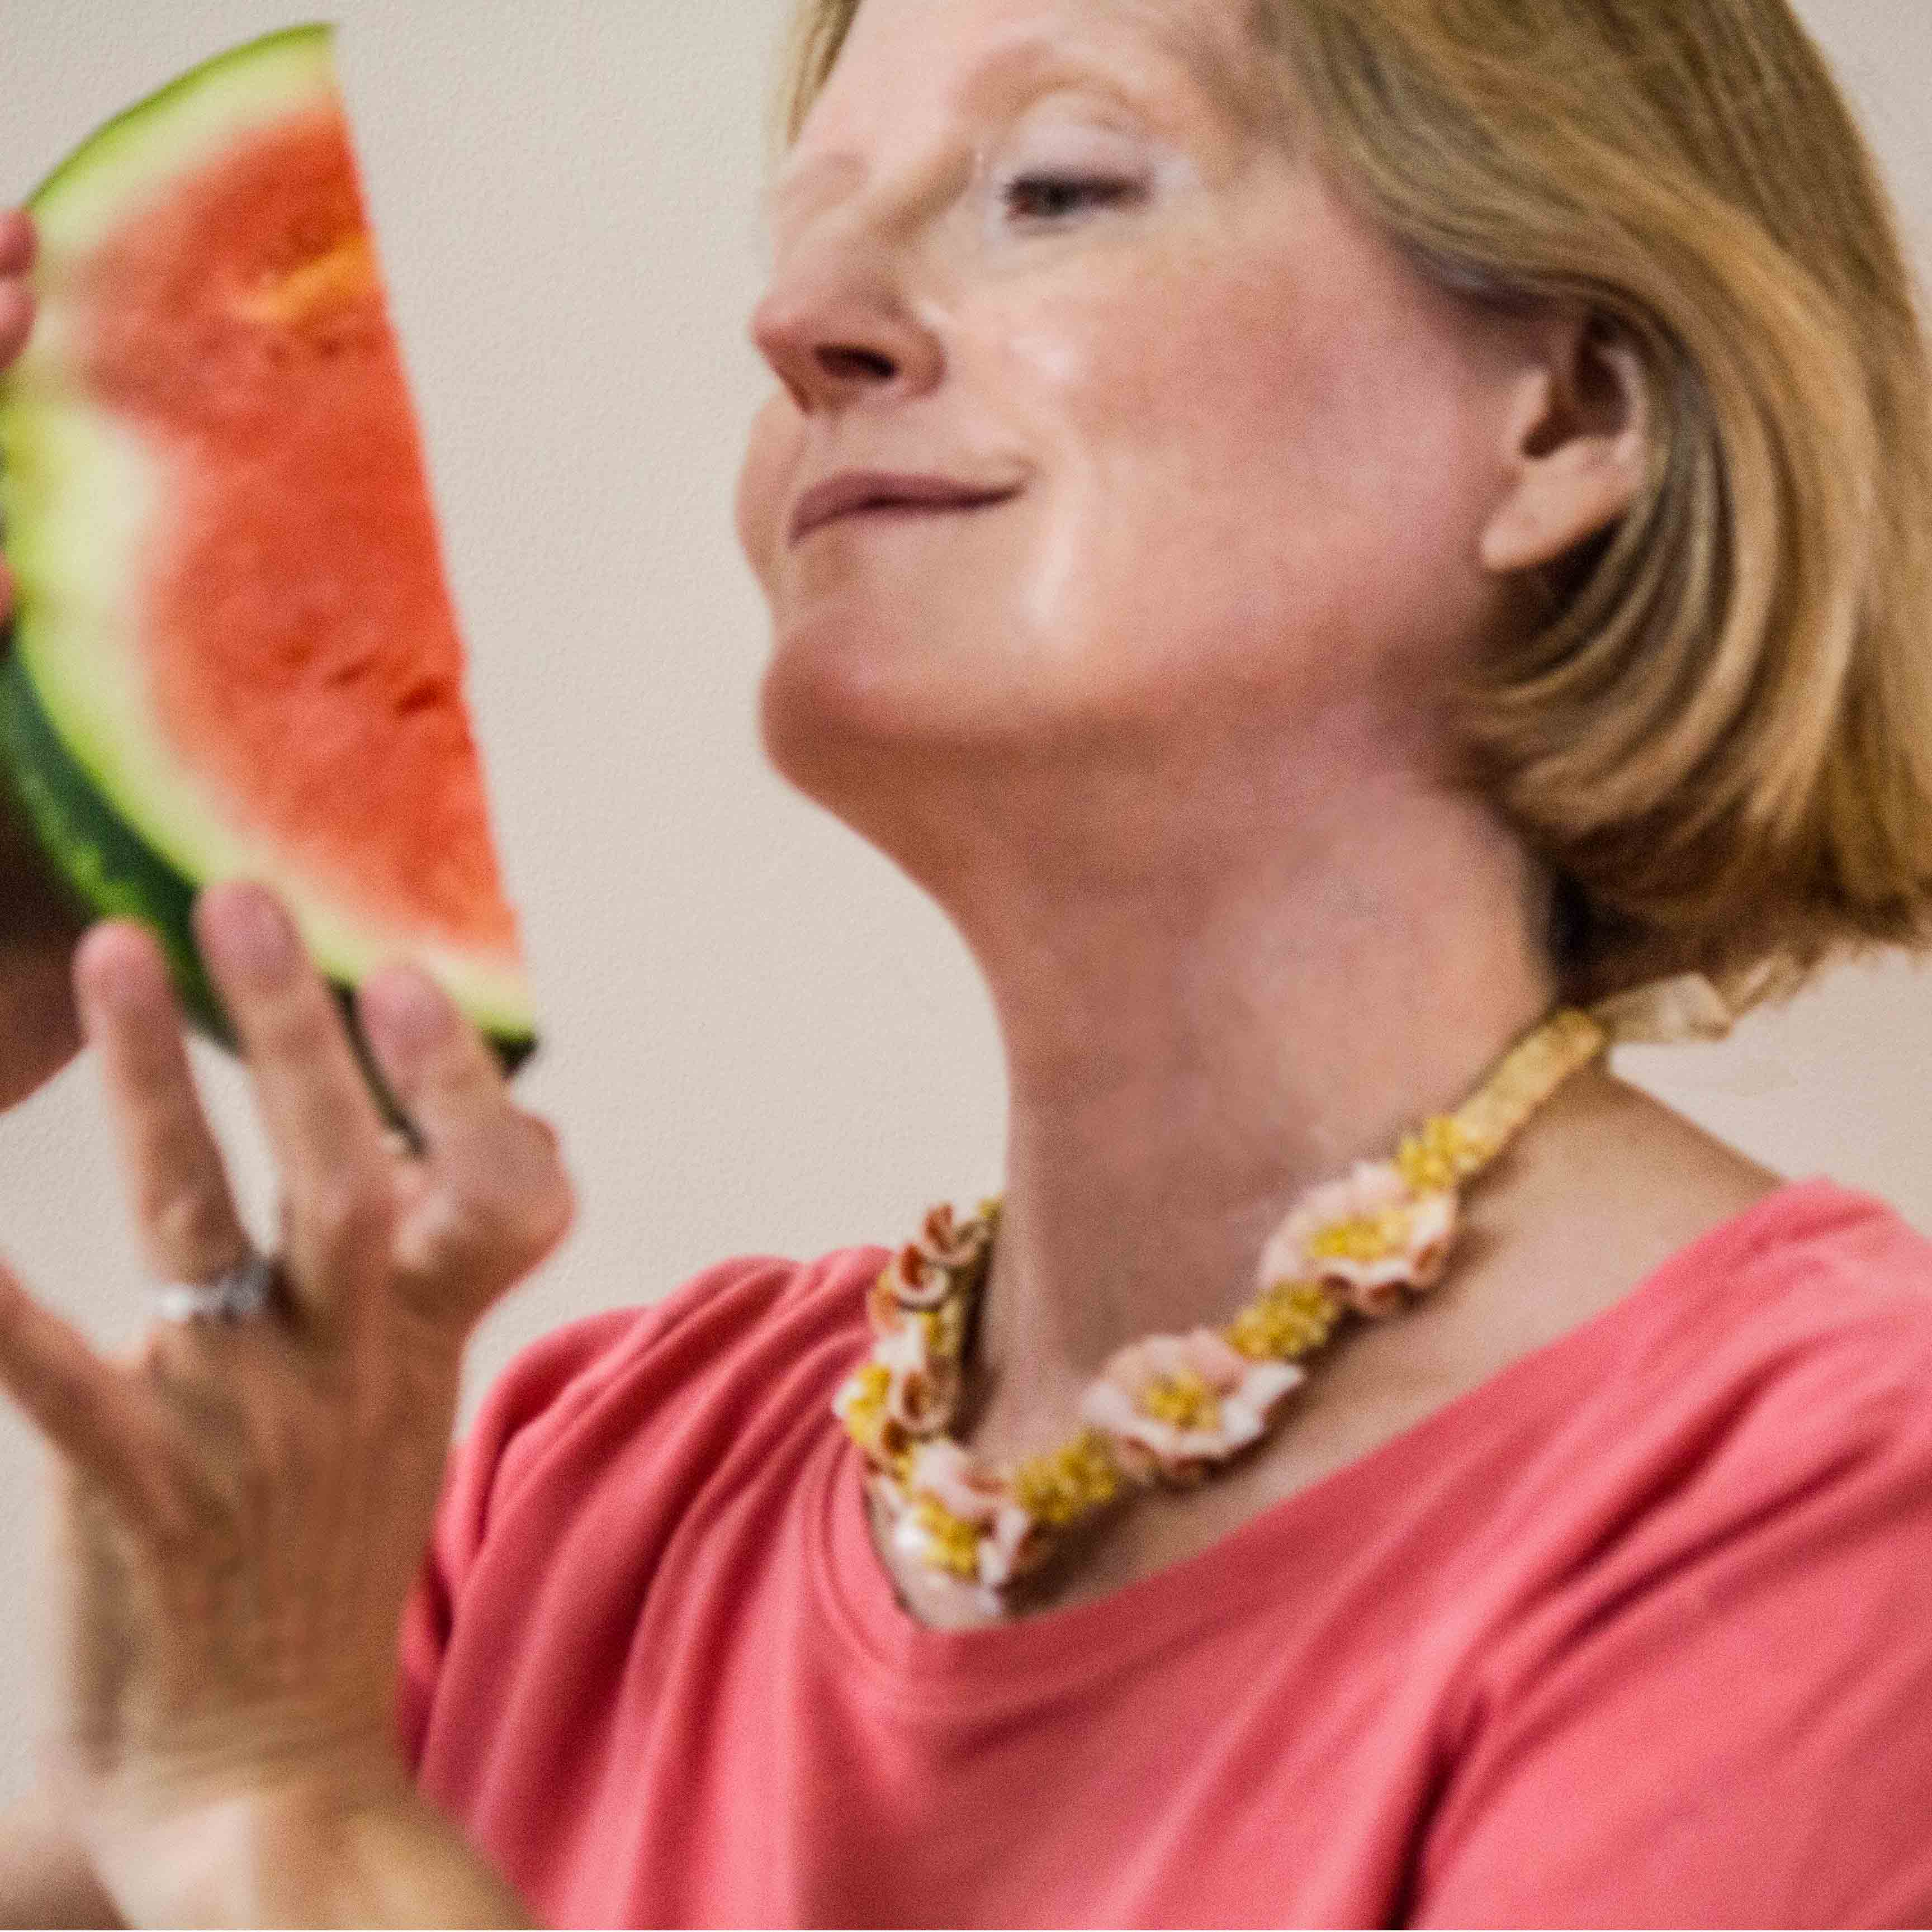 Watermelon avv